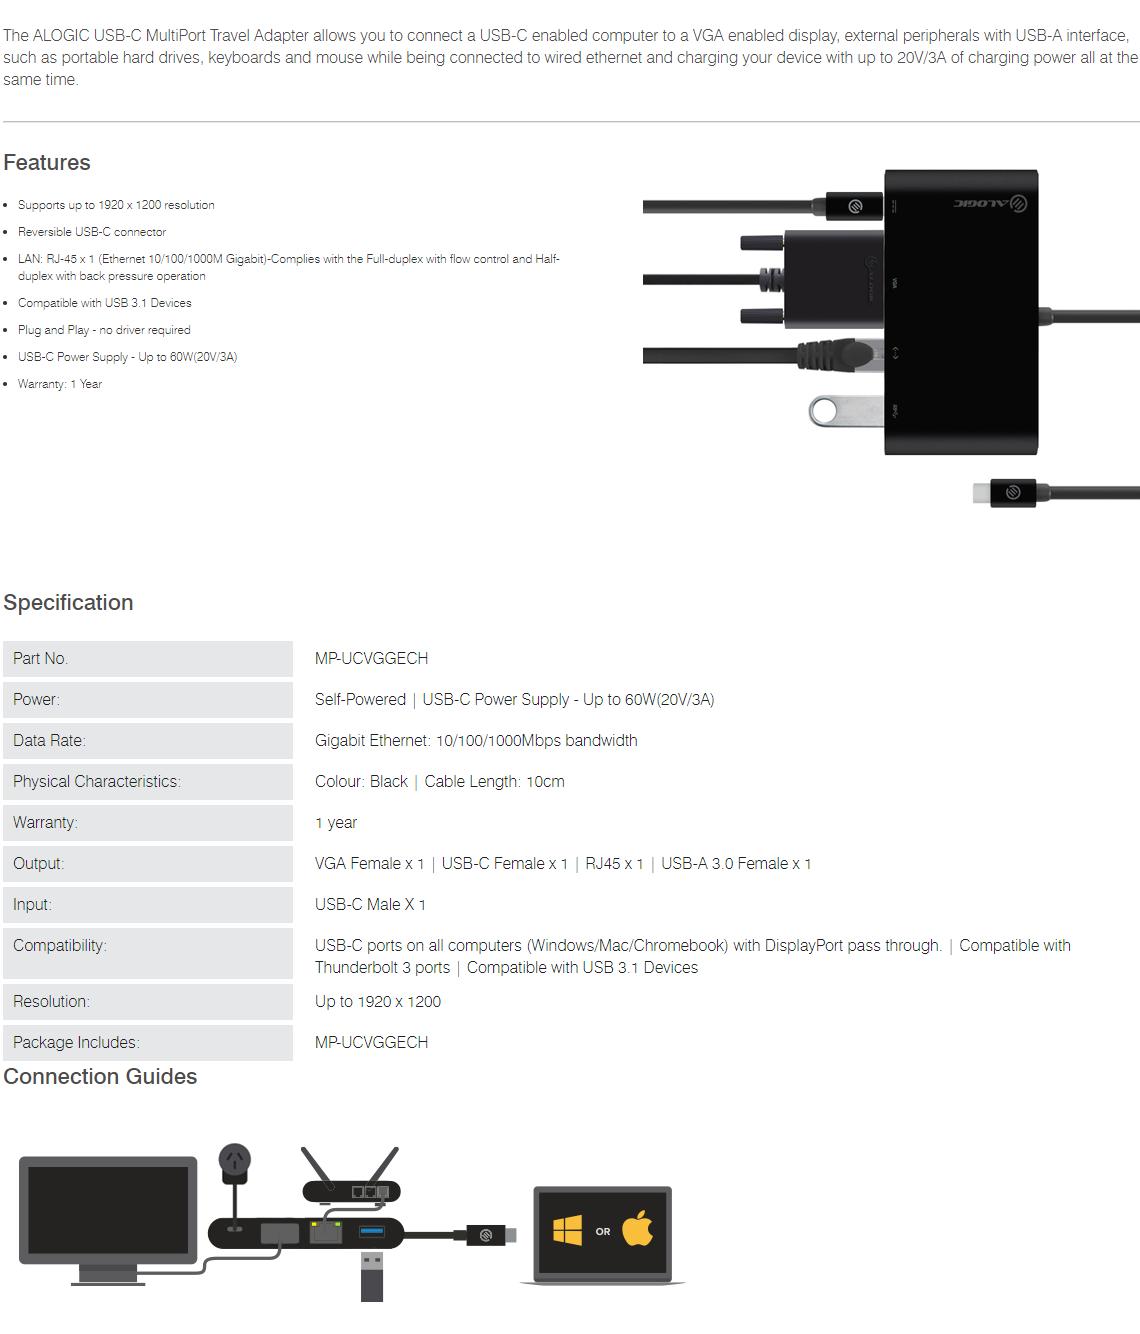 Alogic USB-C Multiport Adapter with VGA/USB-A/Gigabit Ethernet/USB-C MP-UCVGGECH